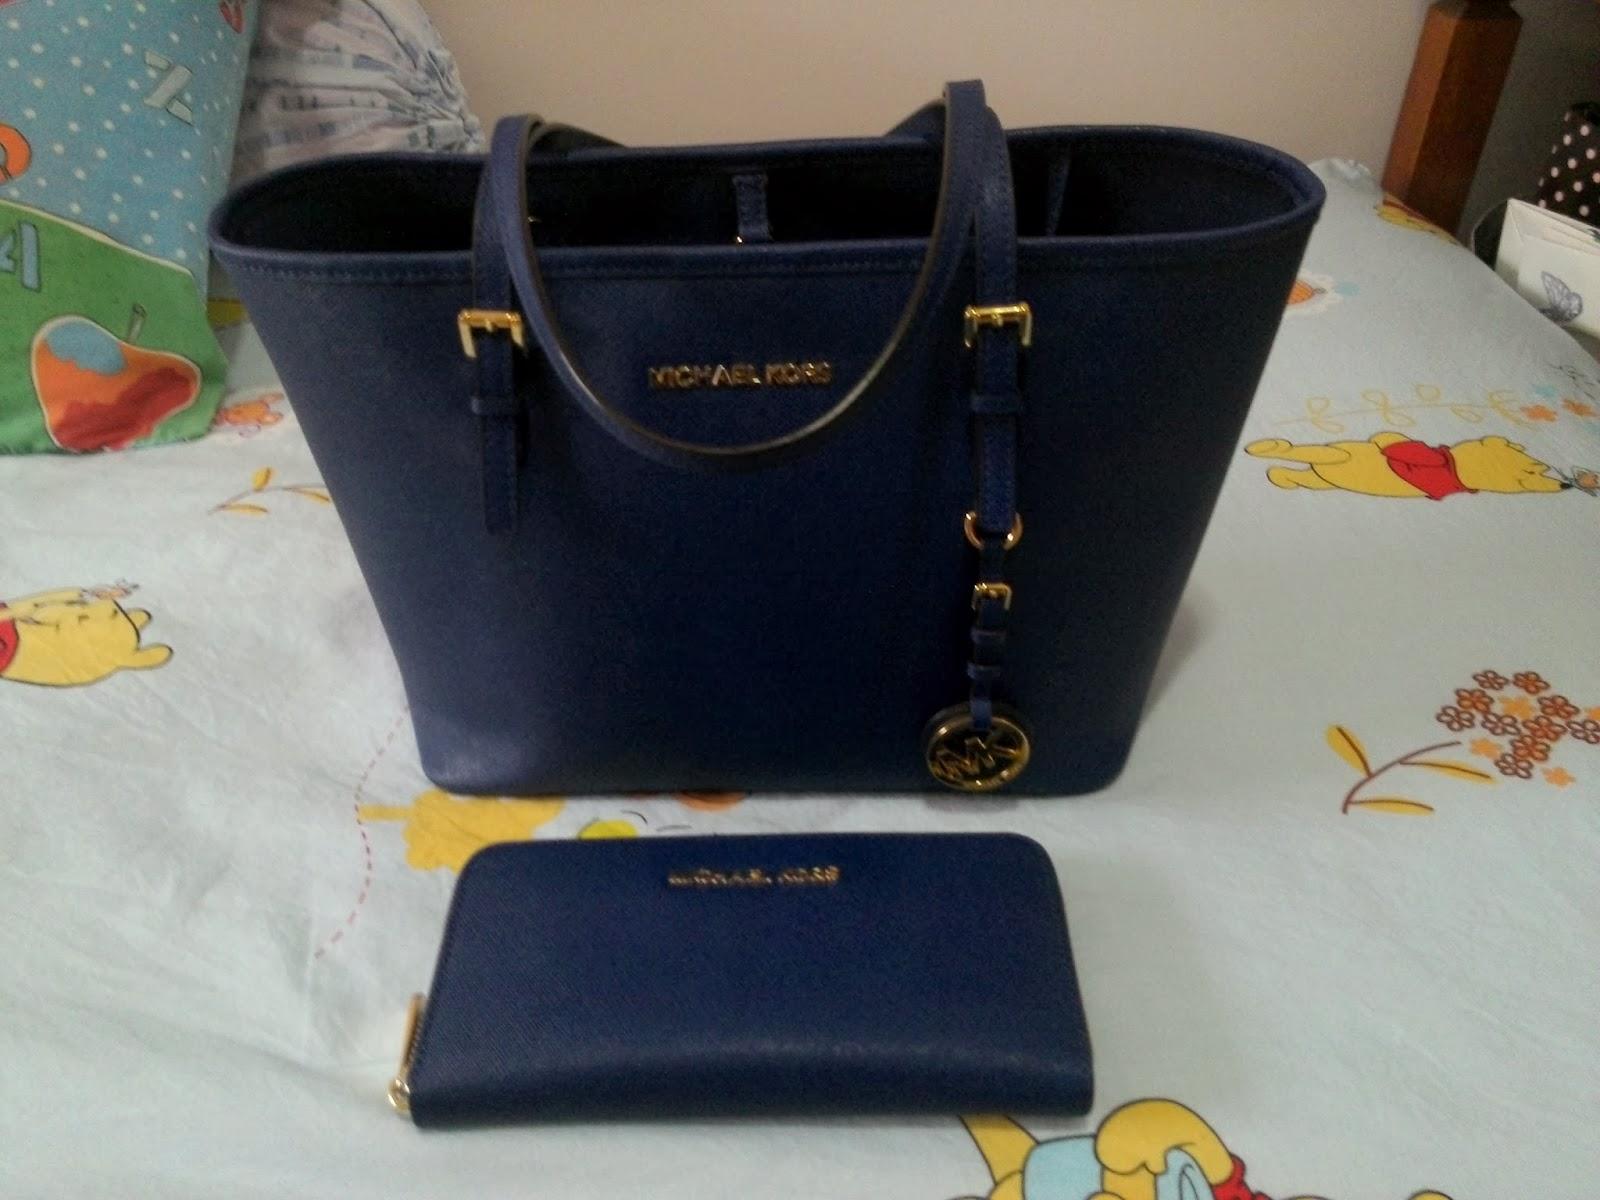 Used Michael Kors Handbags >> Canada Michael Kors Selma Bag Claret Used 499e8 F4228